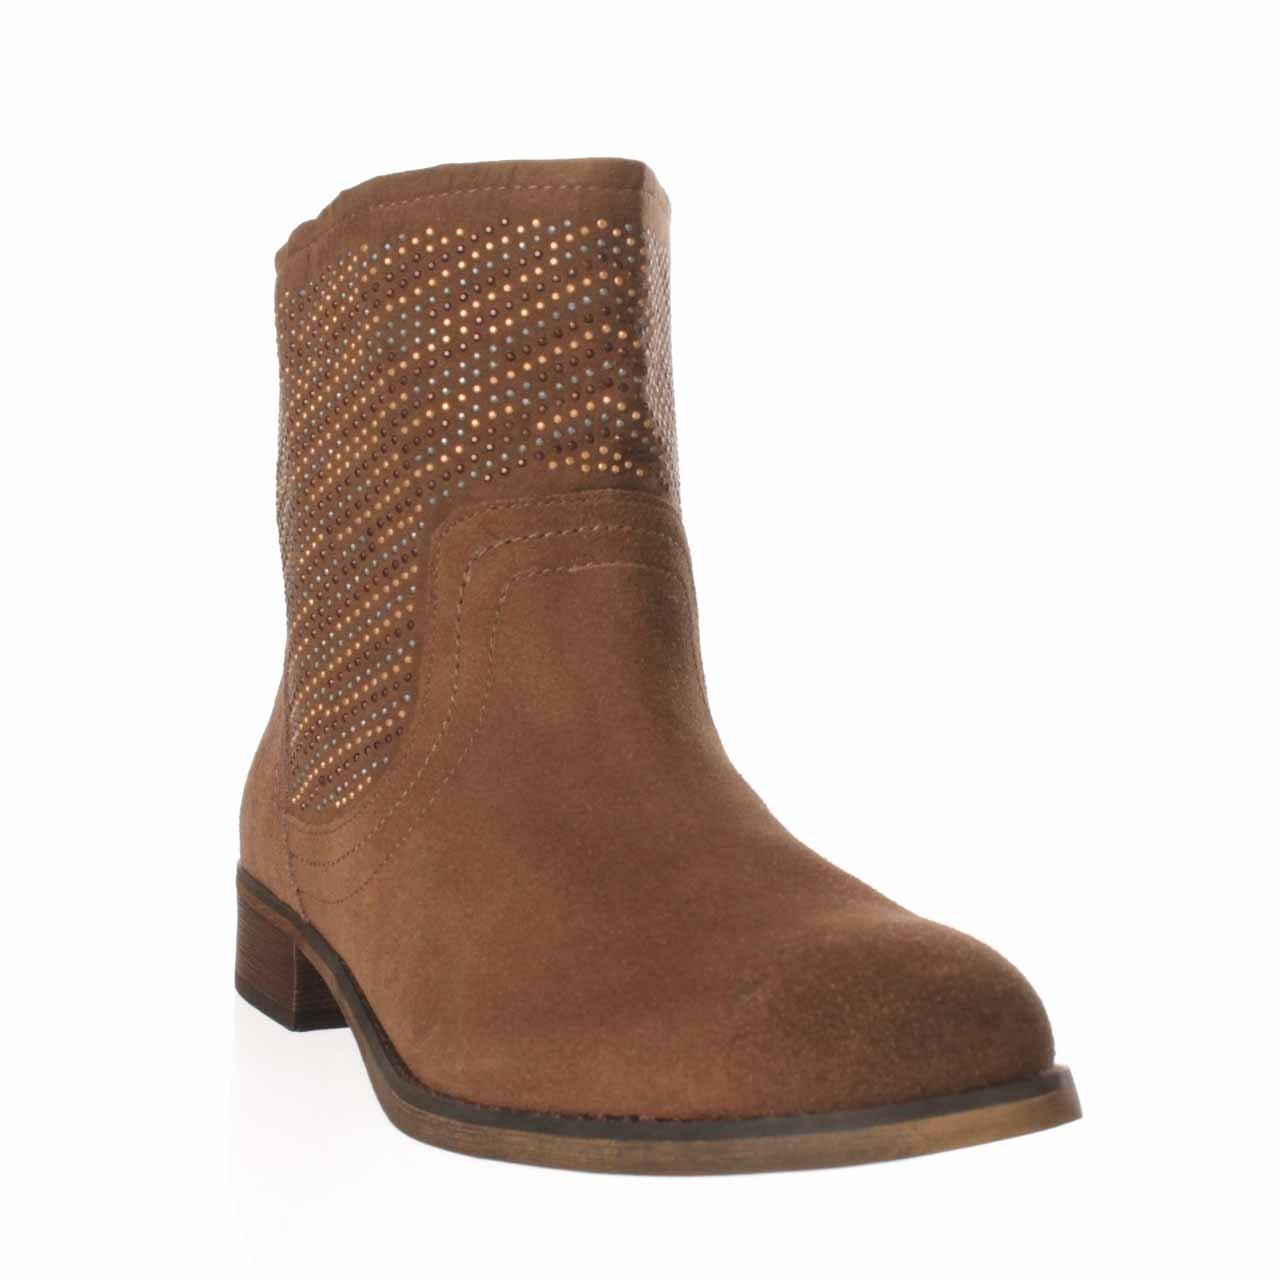 carlos by carlos santana alton ankle boot in brown lyst